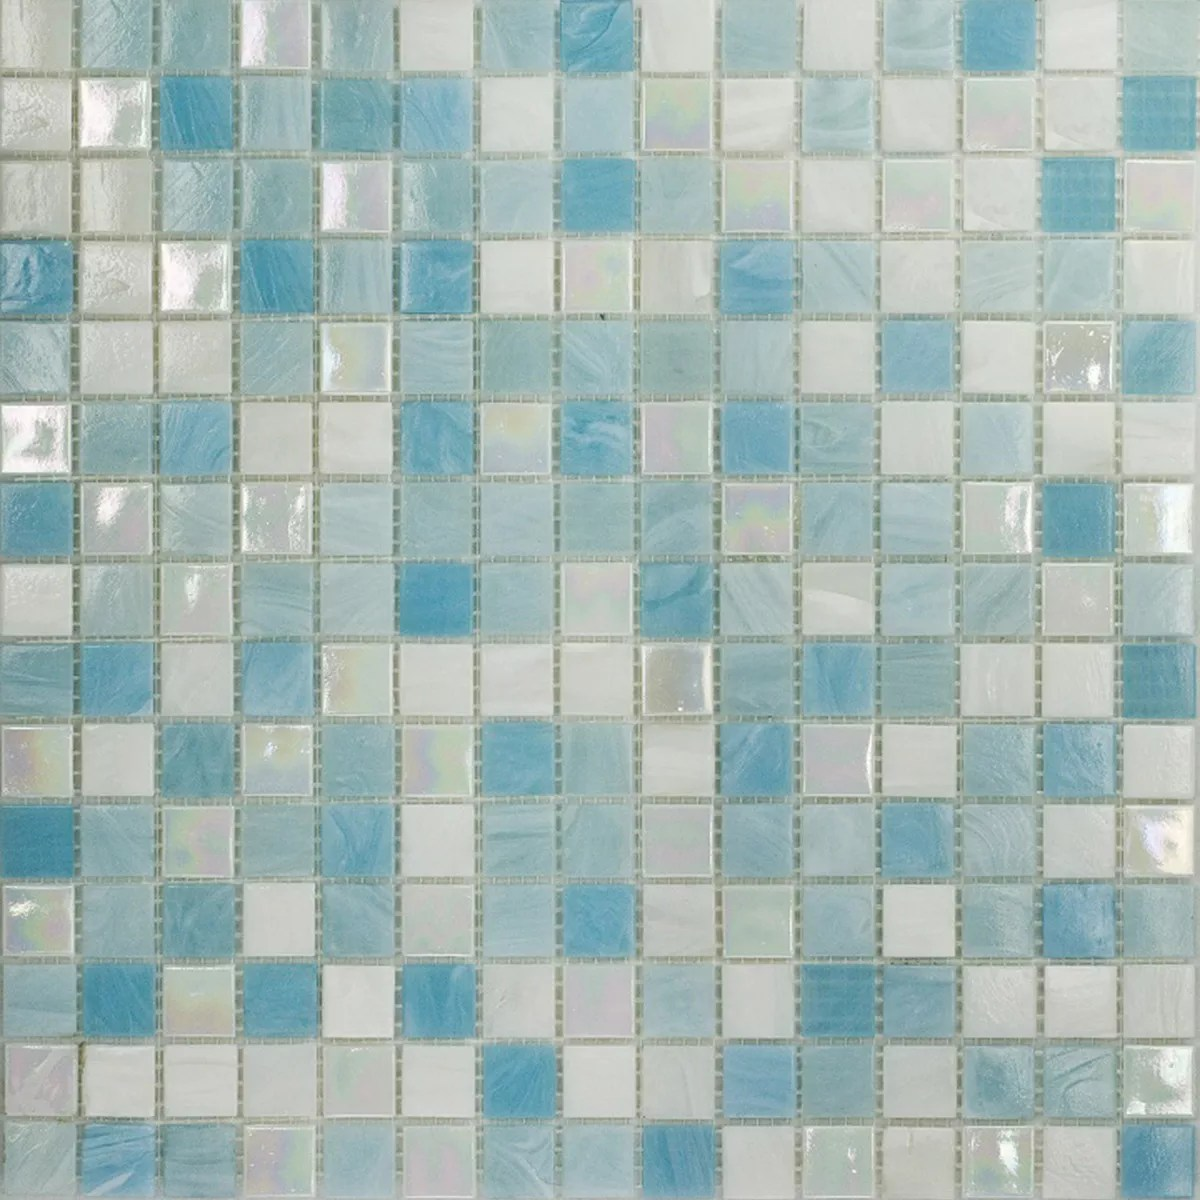 Piastrelle Bagno Mosaico Azzurro YL85  Regardsdefemmes